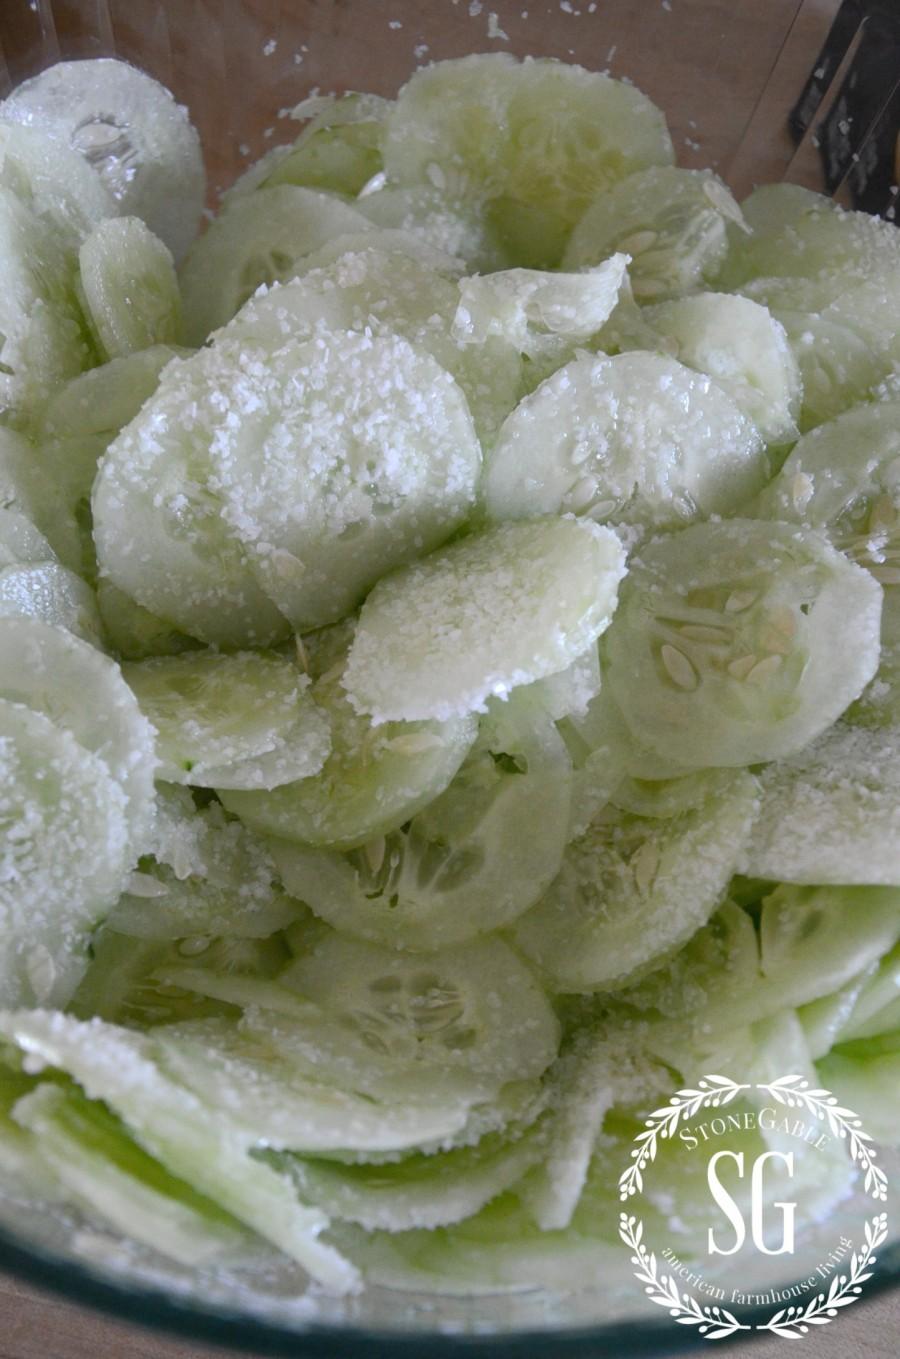 CUCUMBER SALAD-sliced cukes-salted-stonegableblog.com